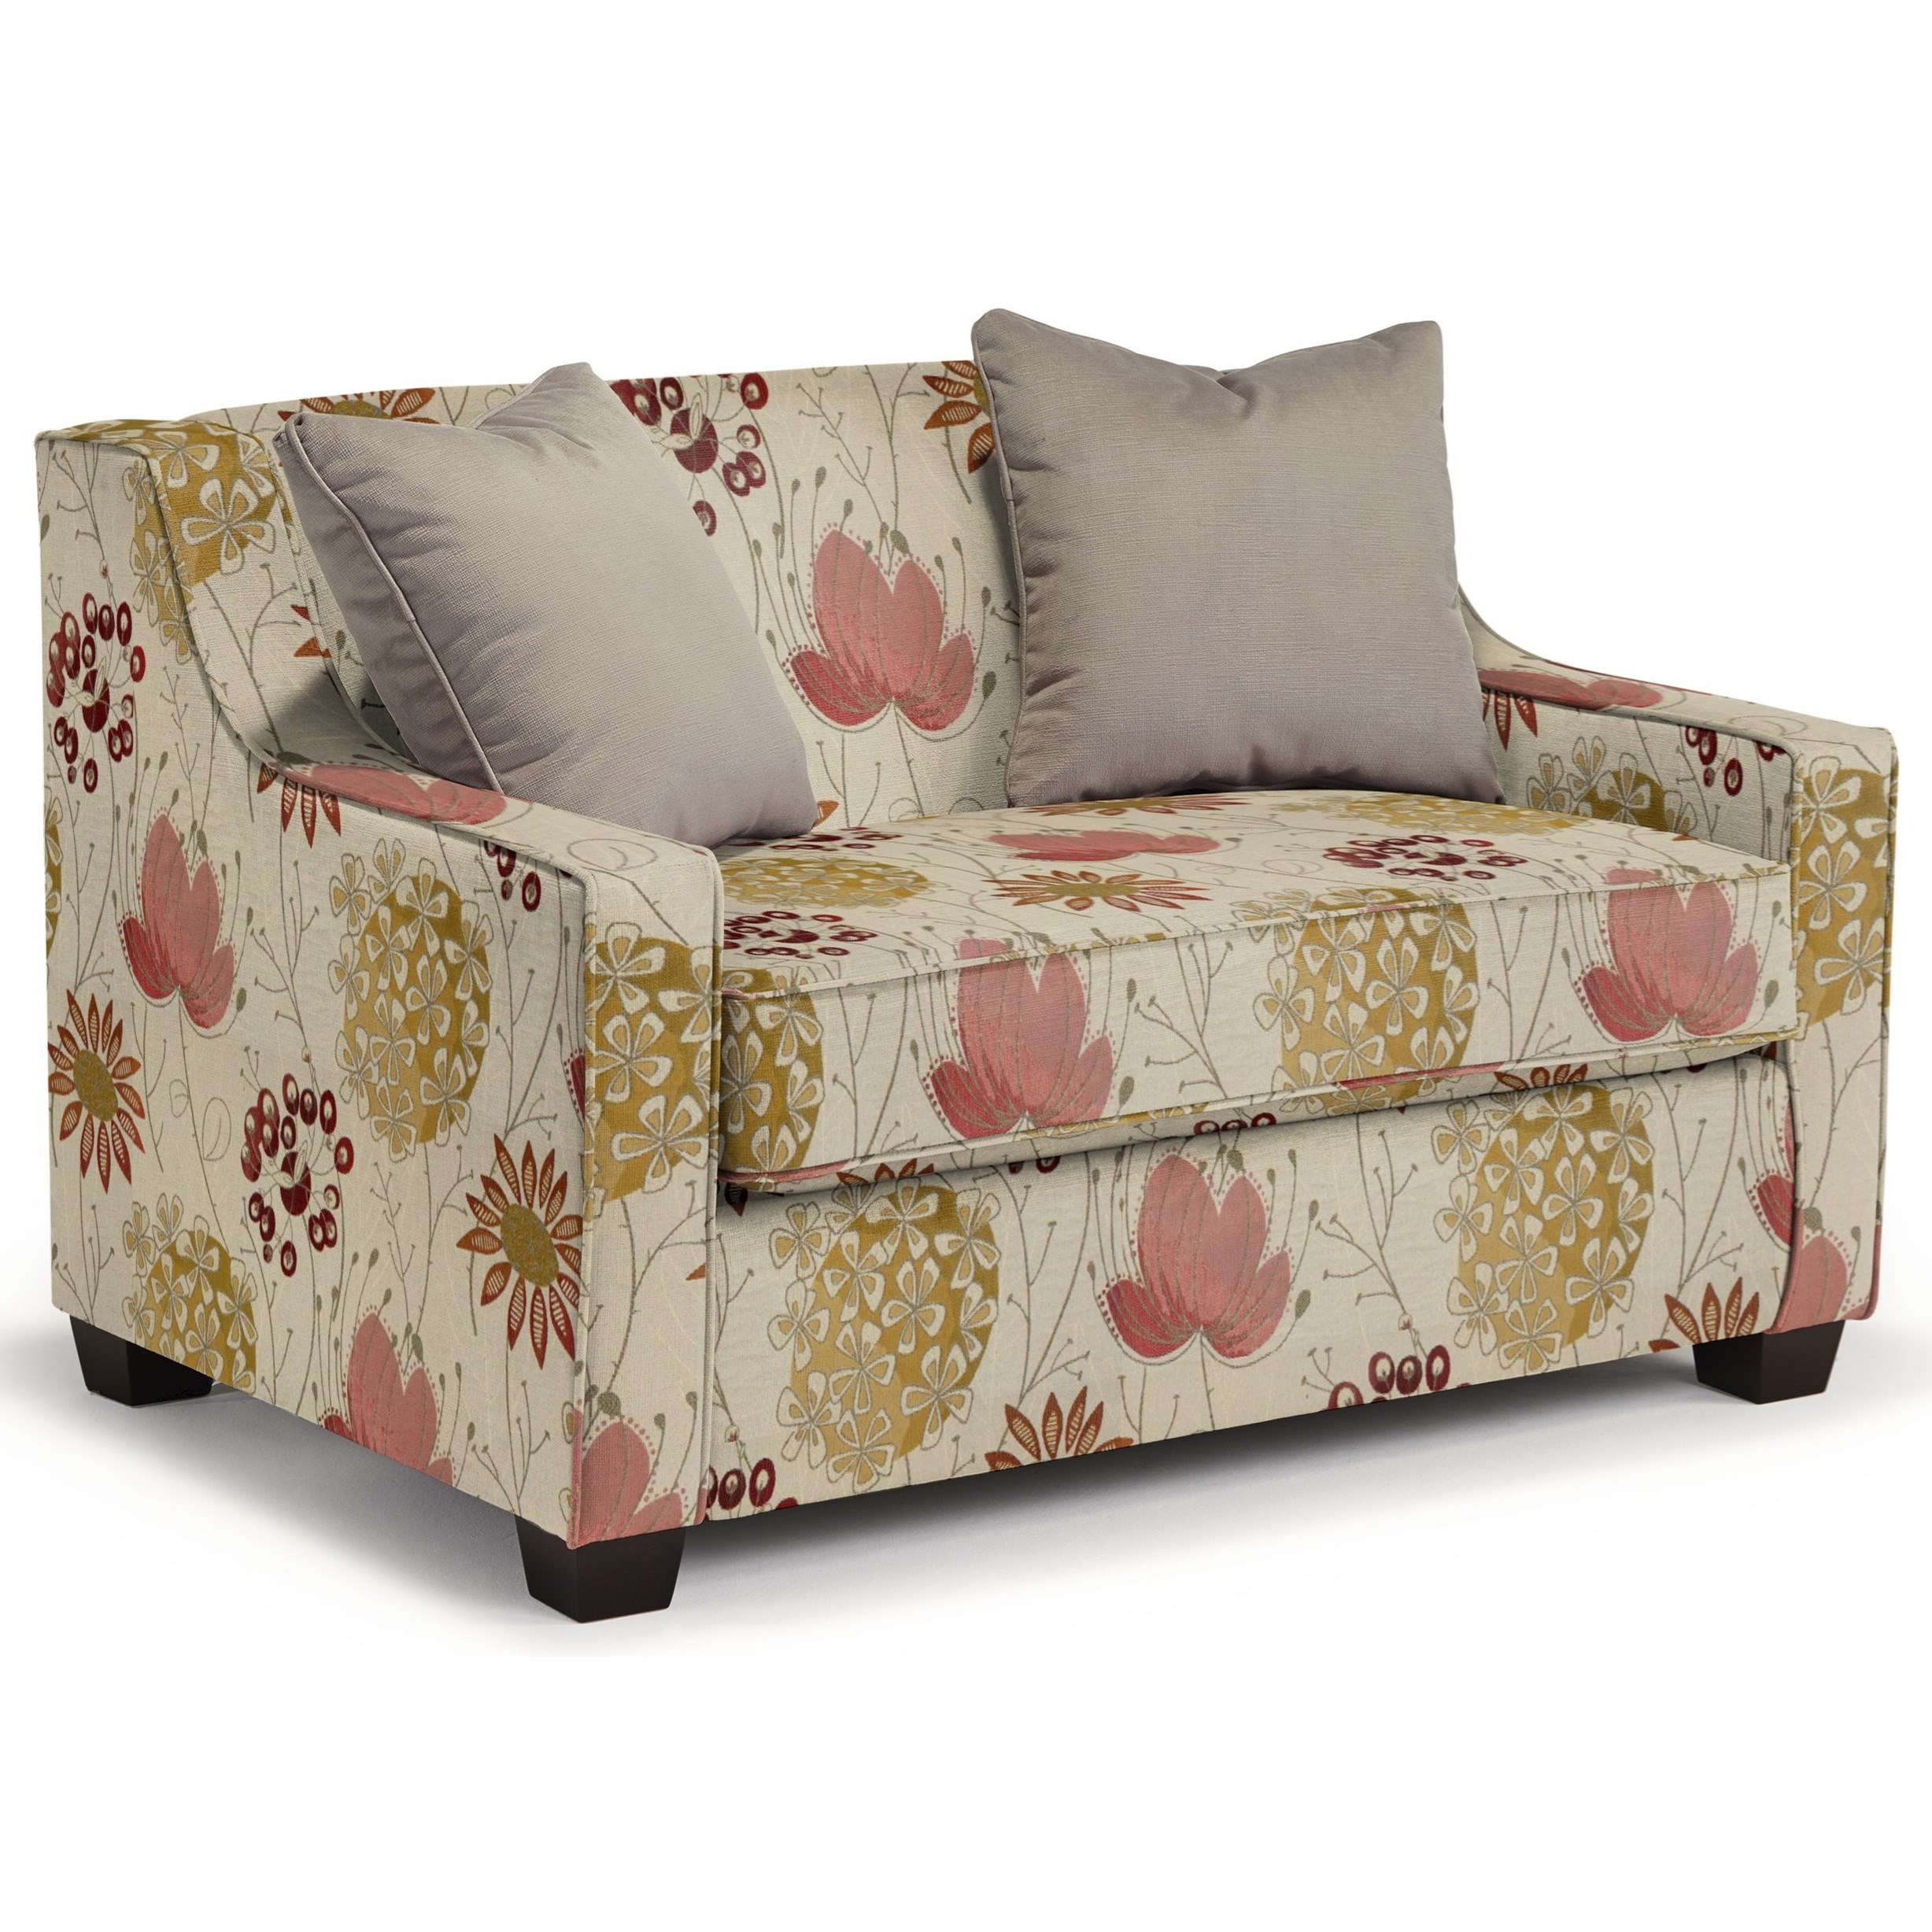 Marinette Twin Air Dream Sleeper Chair by Best Home Furnishings at Lucas Furniture & Mattress